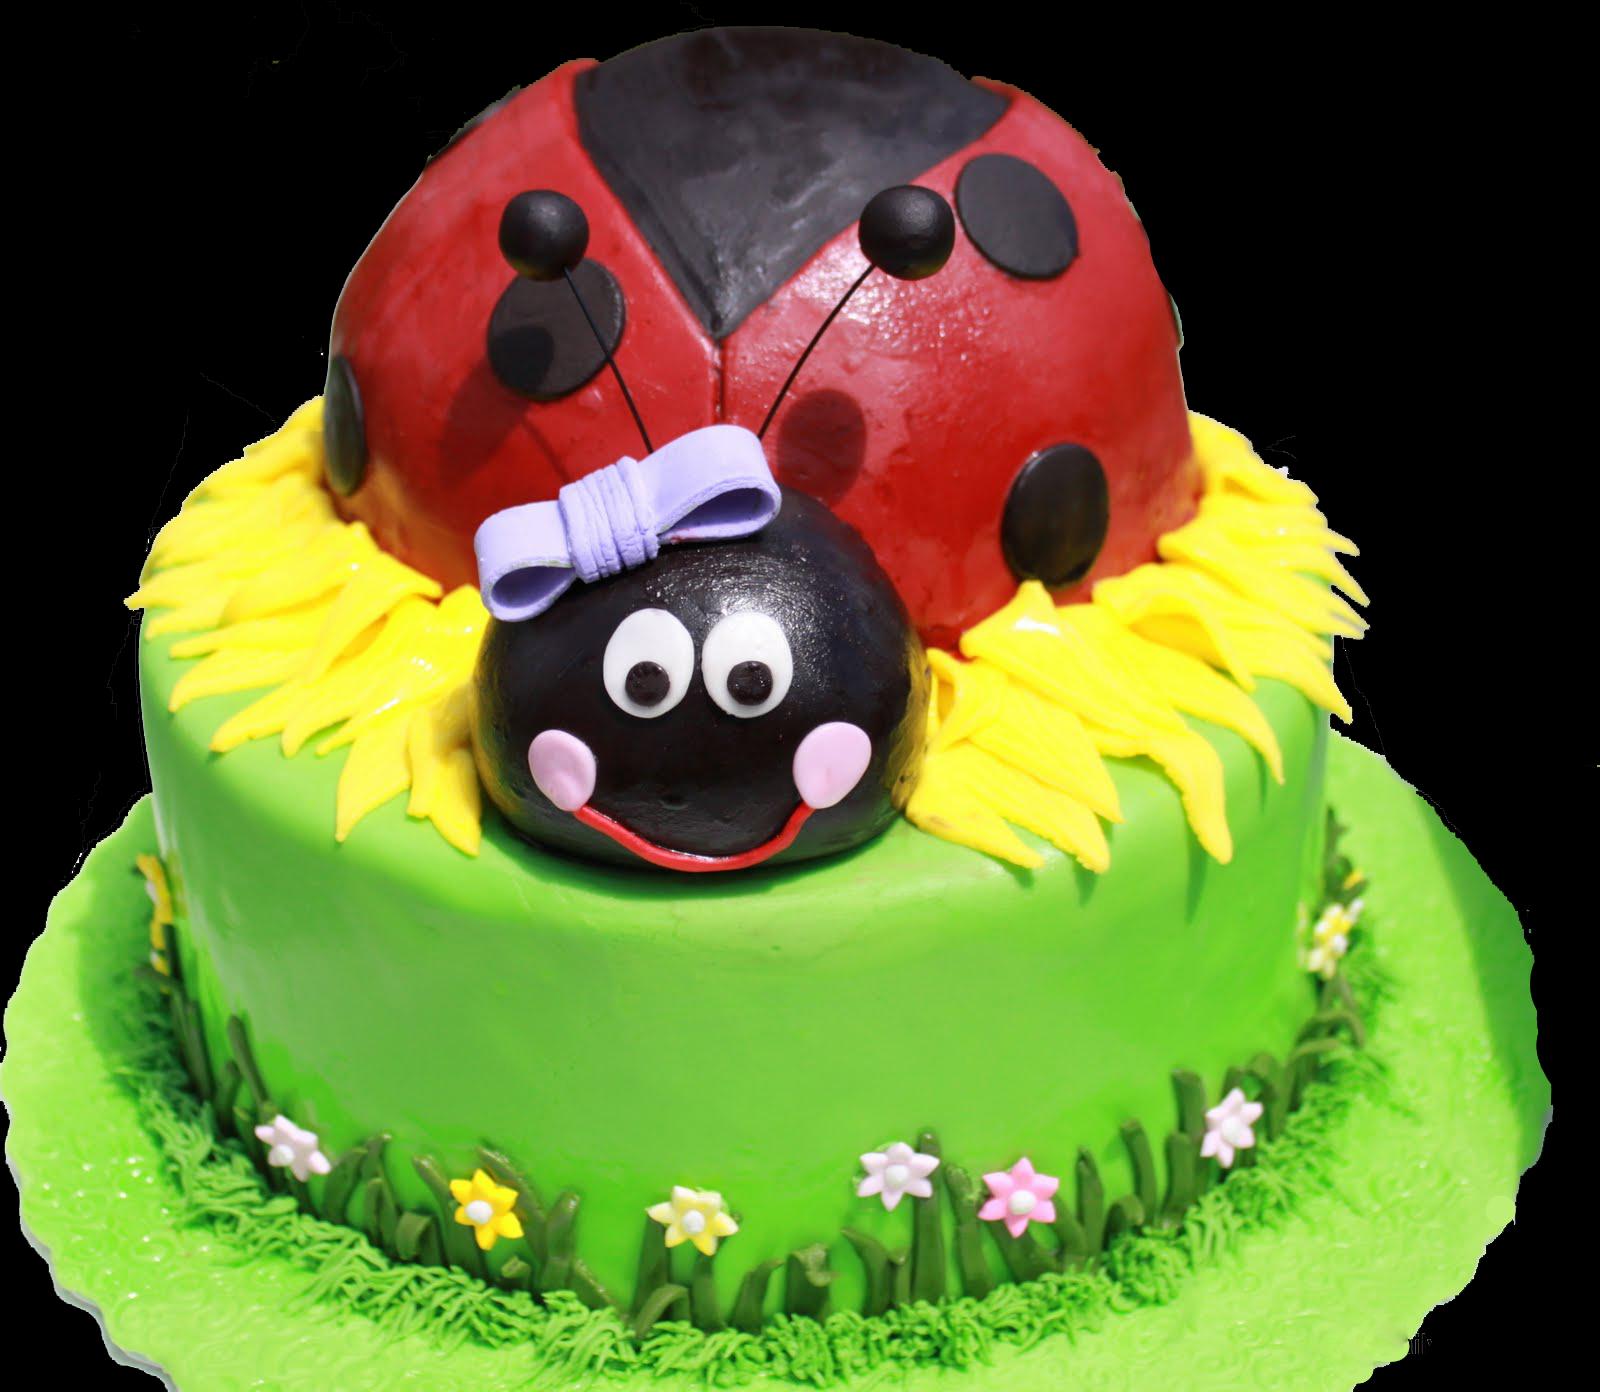 Remarkable Ladybug Birthday Cake Thats My Cake Personalised Birthday Cards Veneteletsinfo